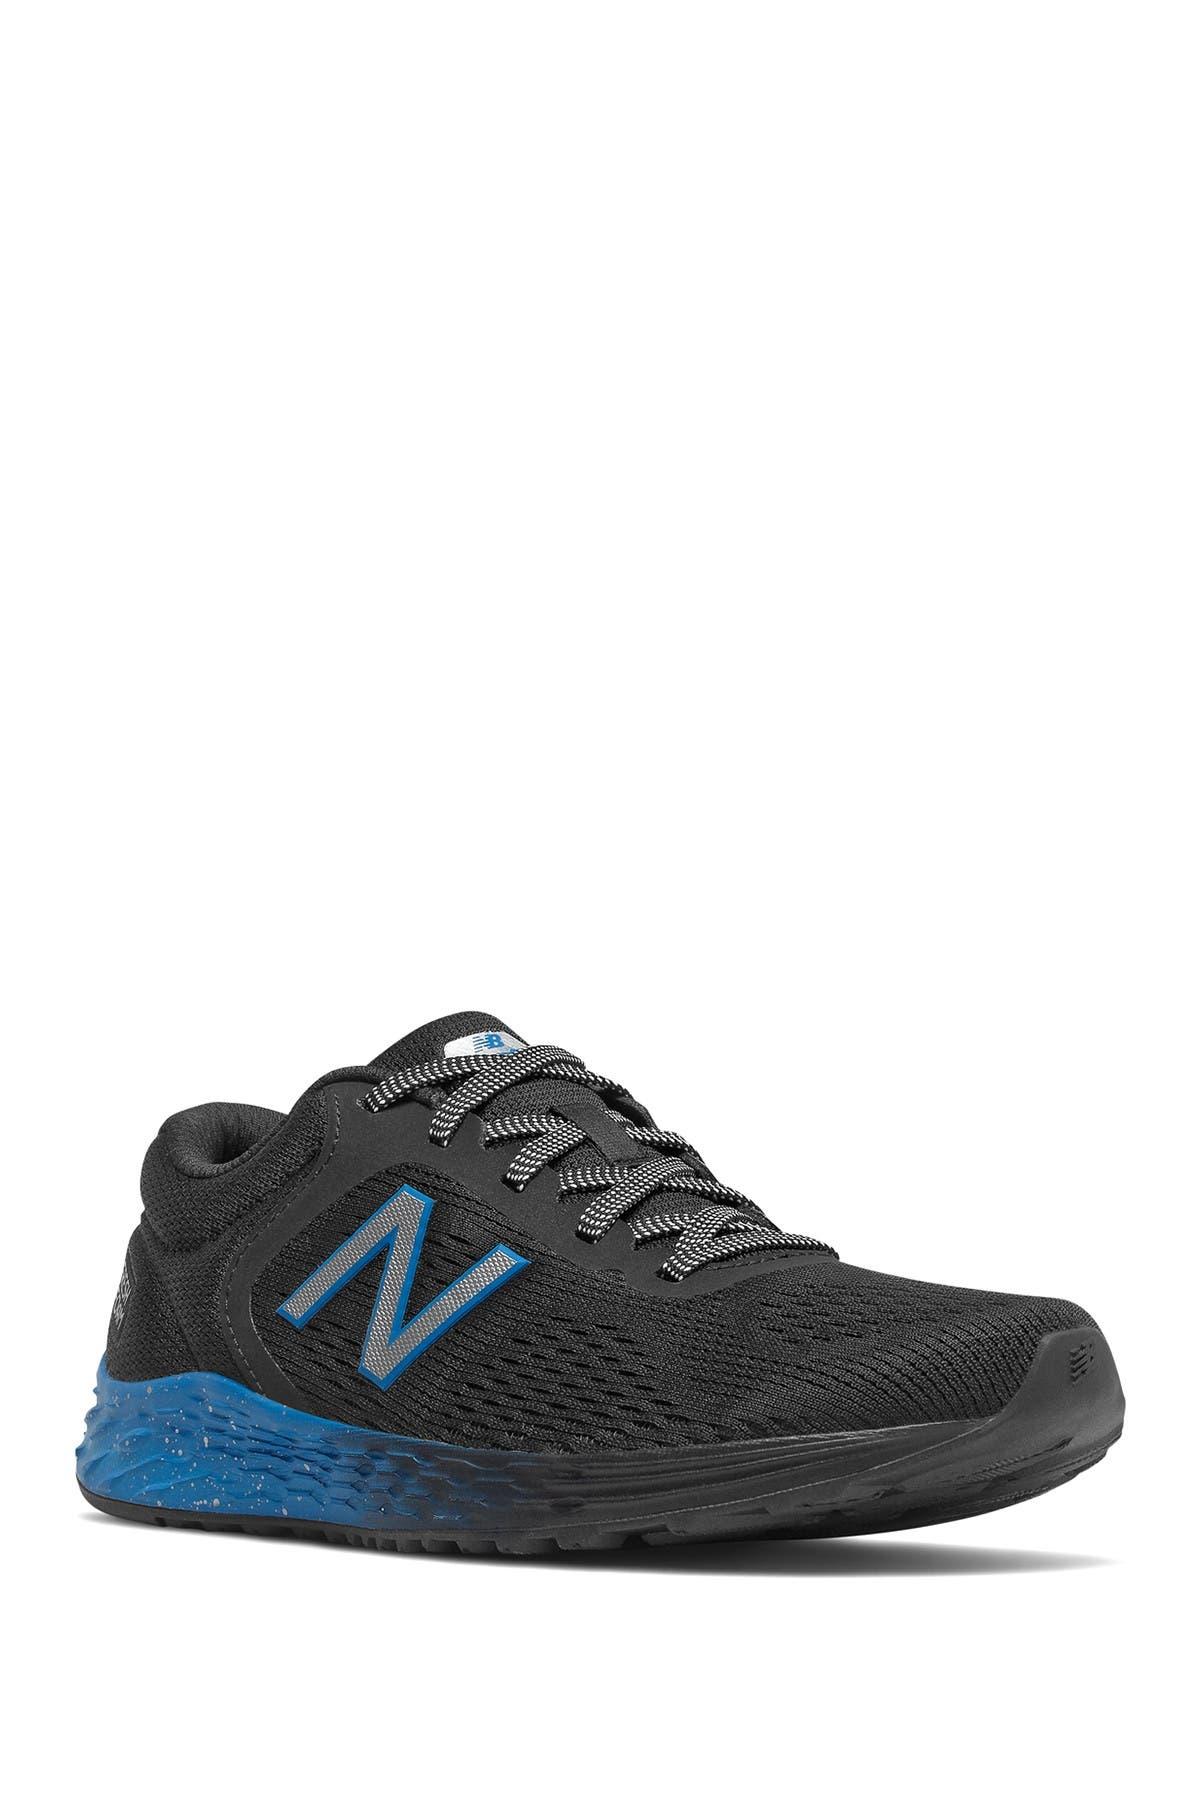 Image of New Balance Arishi Running Shoe